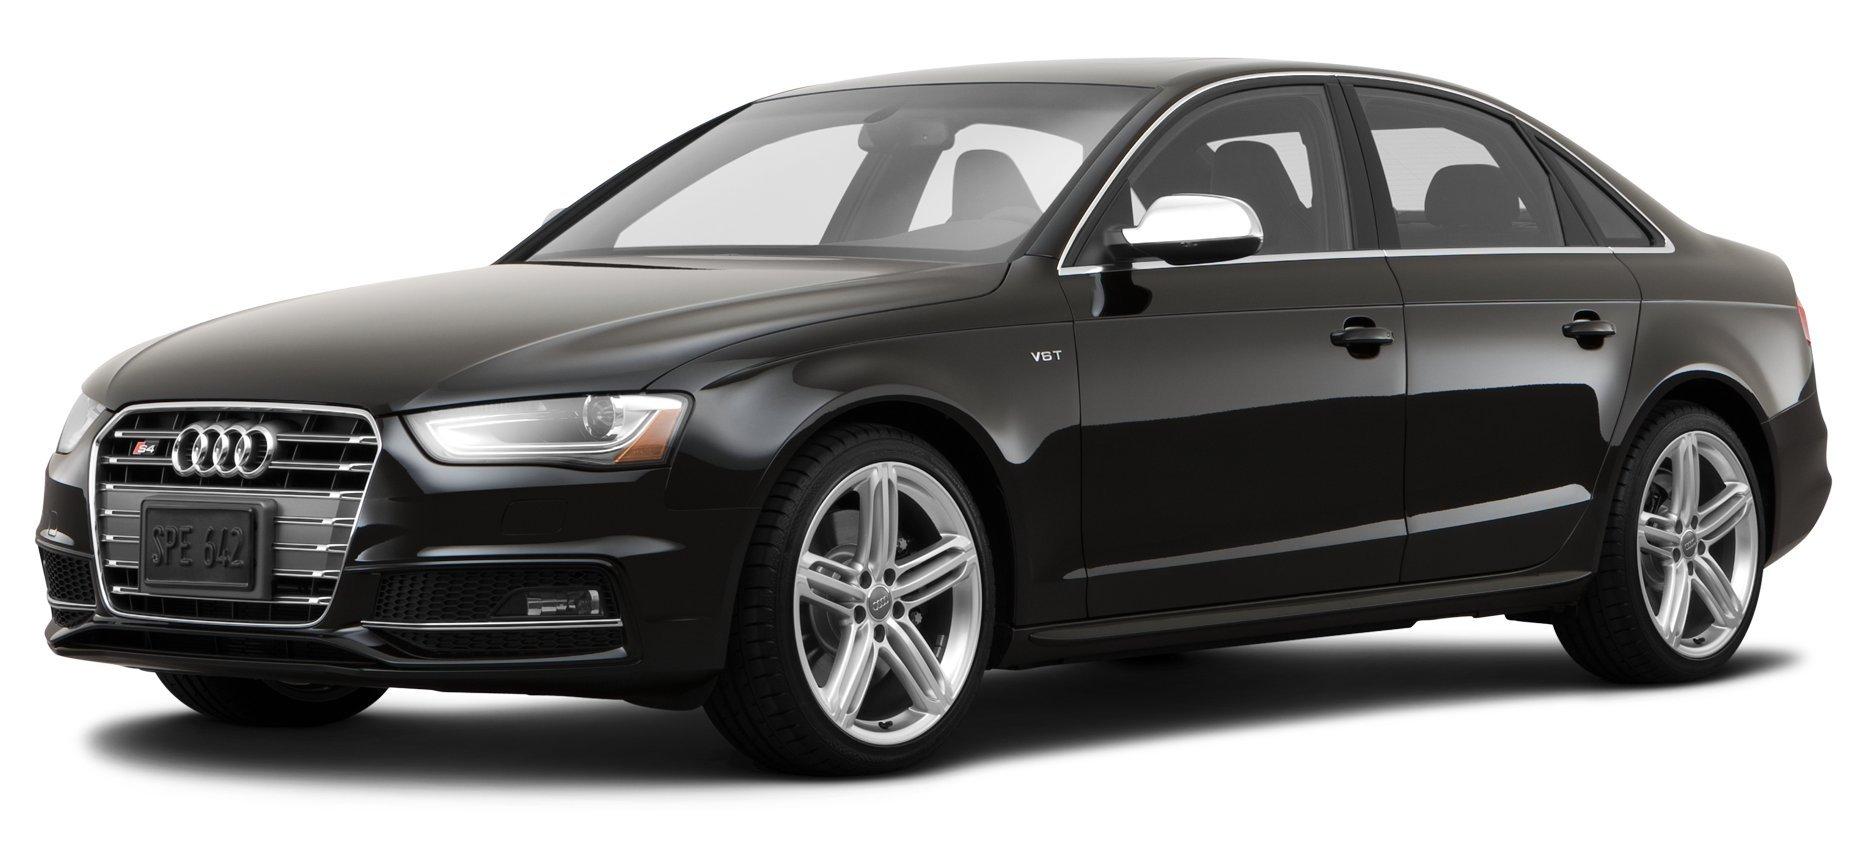 amazon 2014 audi s4 reviews images and specs vehicles 2010 Audi S4 2014 audi s4 premium plus 4 door sedan manual transmission